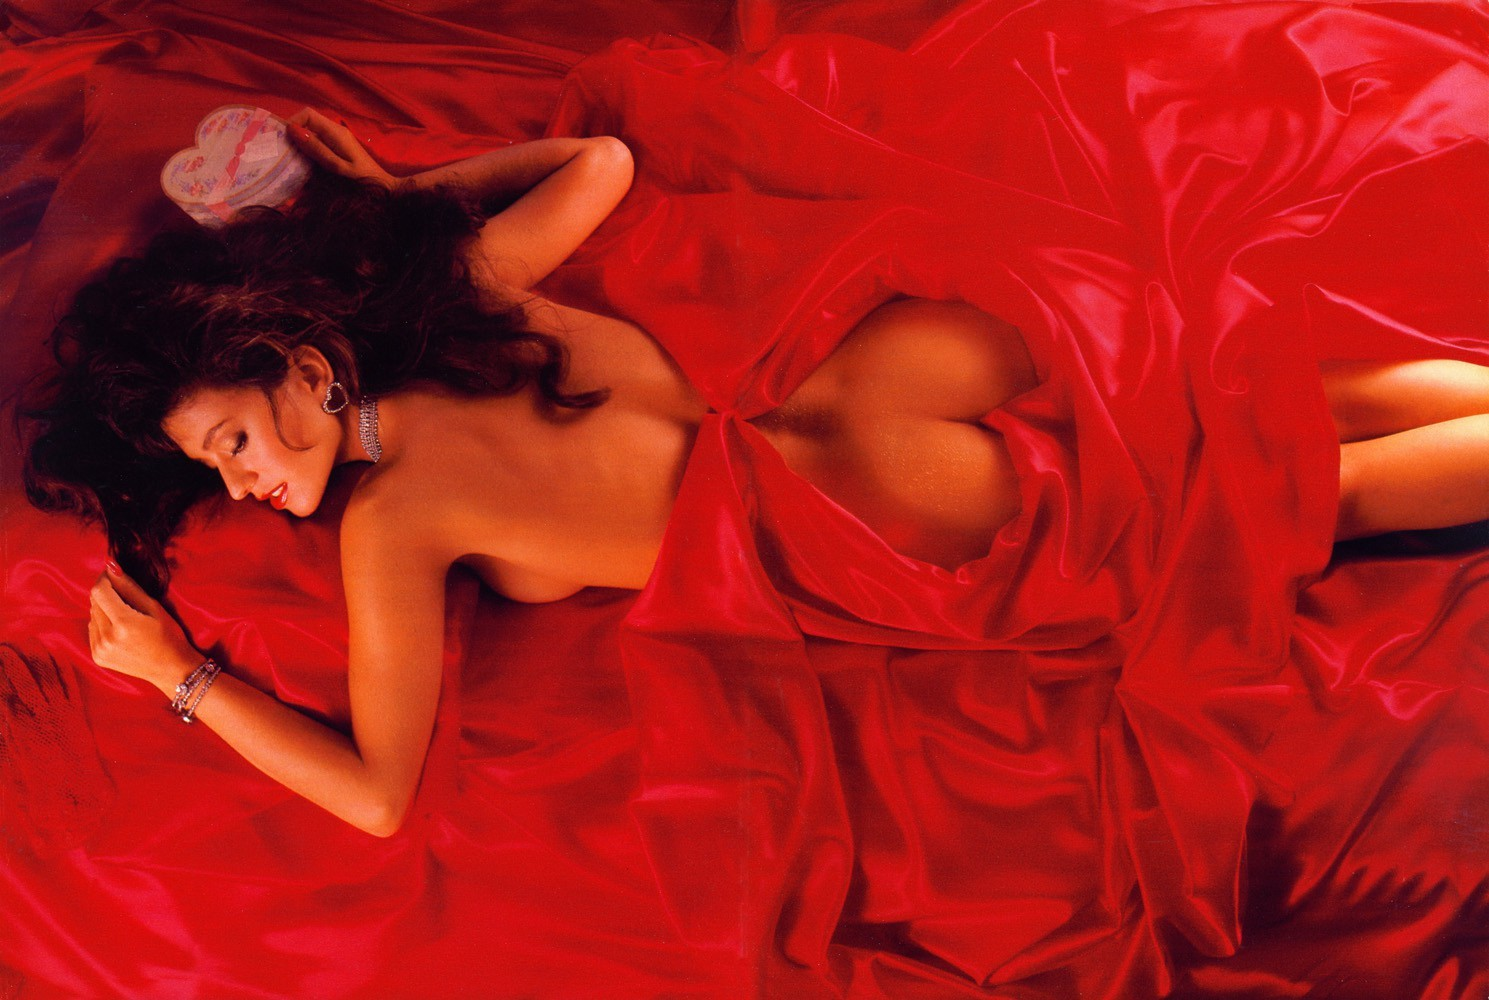 Sexy Valentine Images